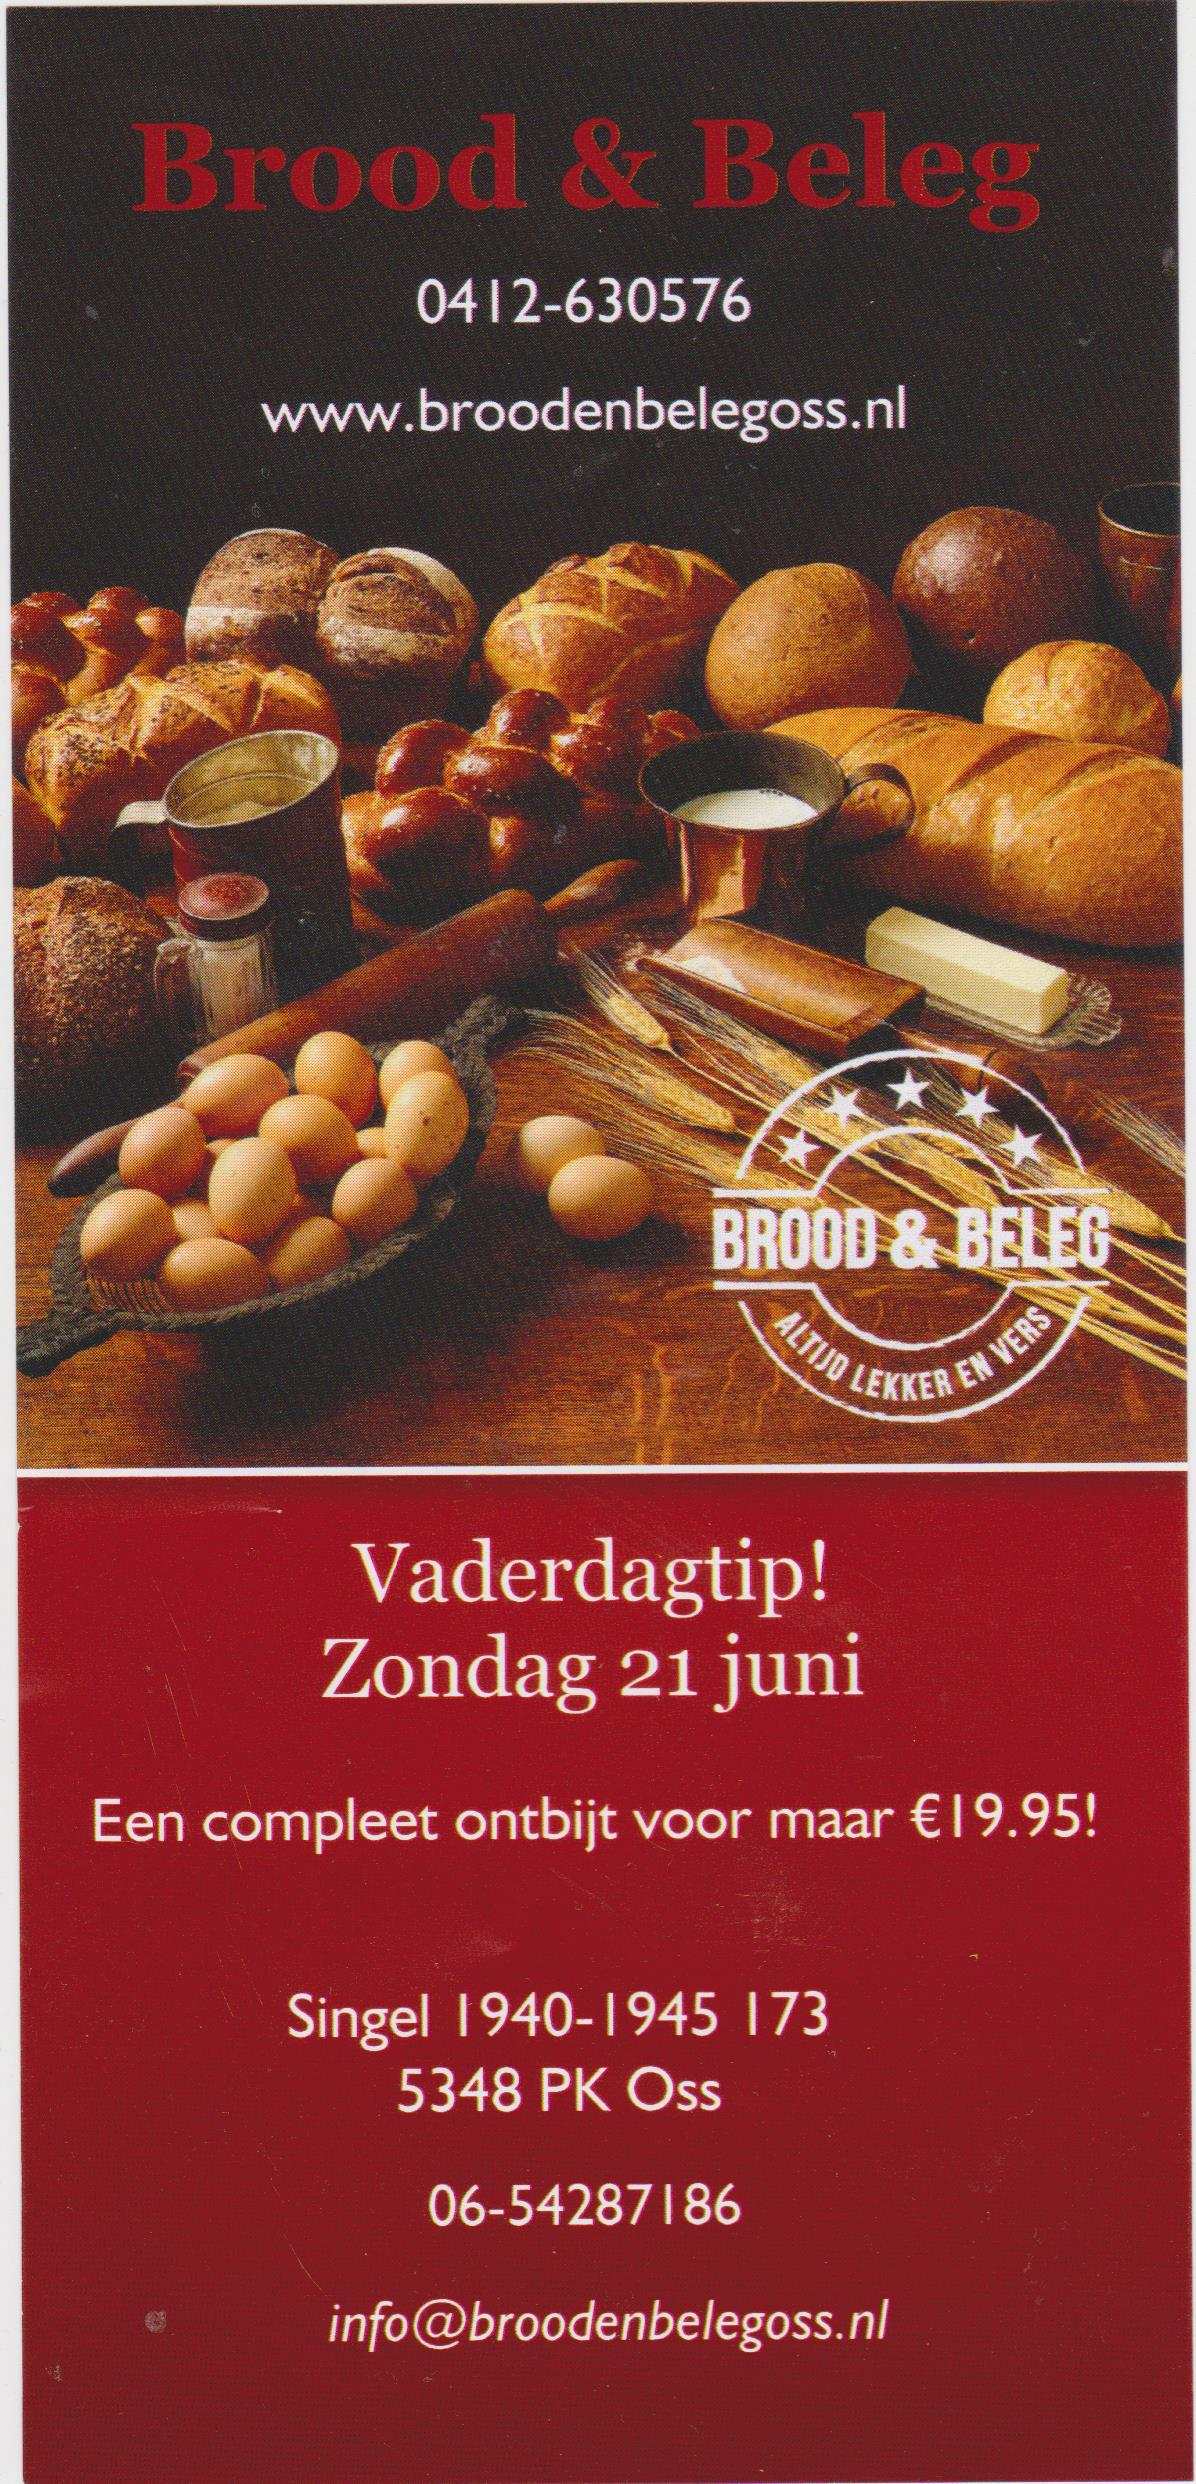 Vaderdag ontbijt Brood & Beleg